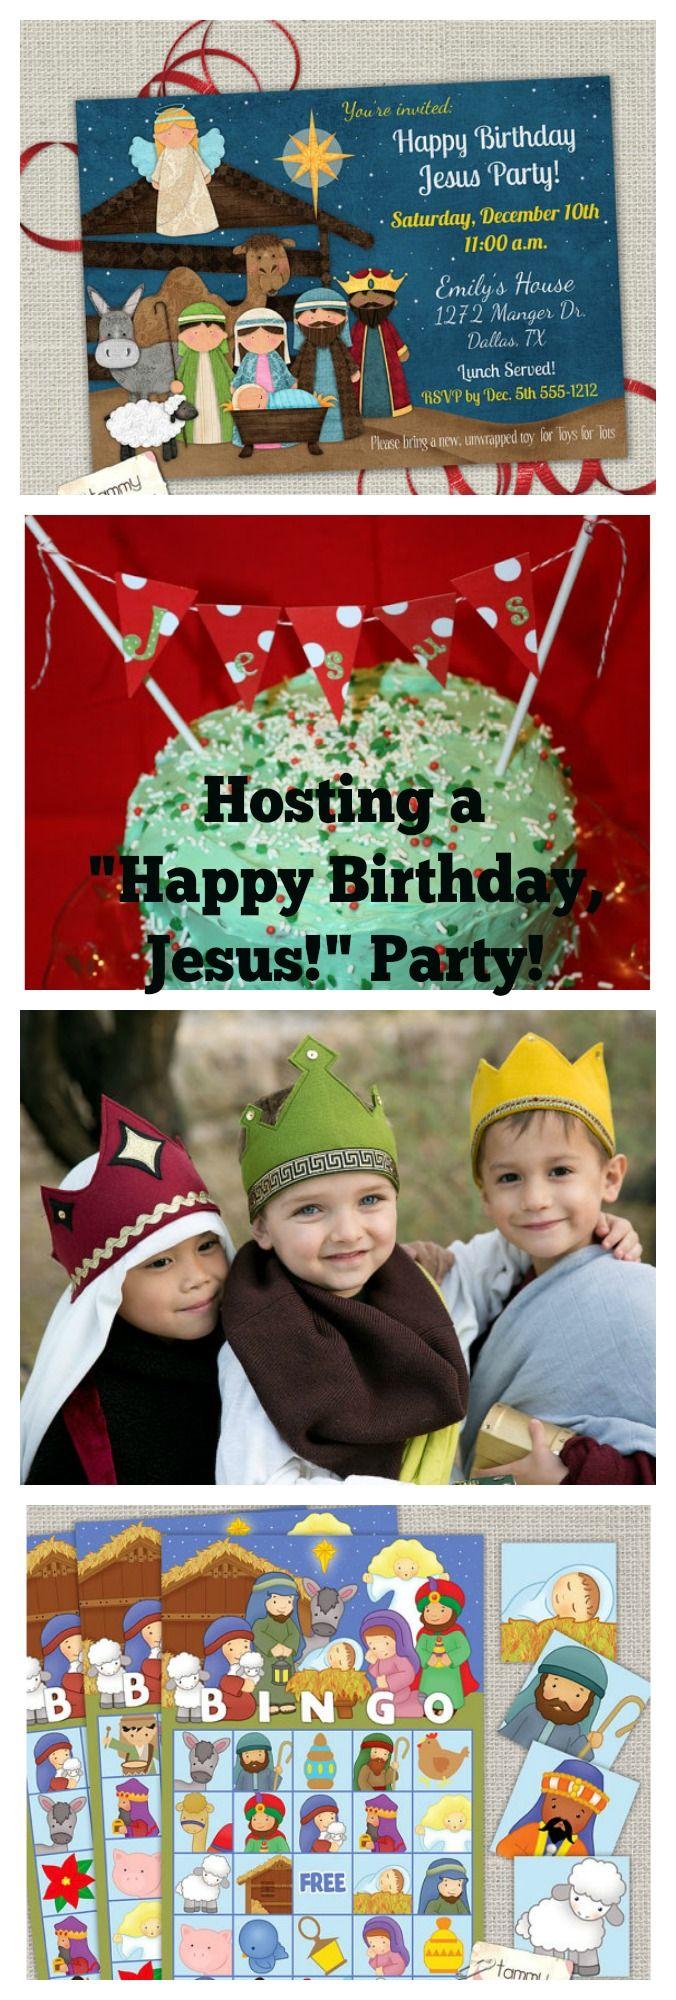 Happy birthday jesus every day cheer happy birthday jesus free happy birthday jesus every day cheer happy birthday jesus free printables and happy birthday kristyandbryce Choice Image